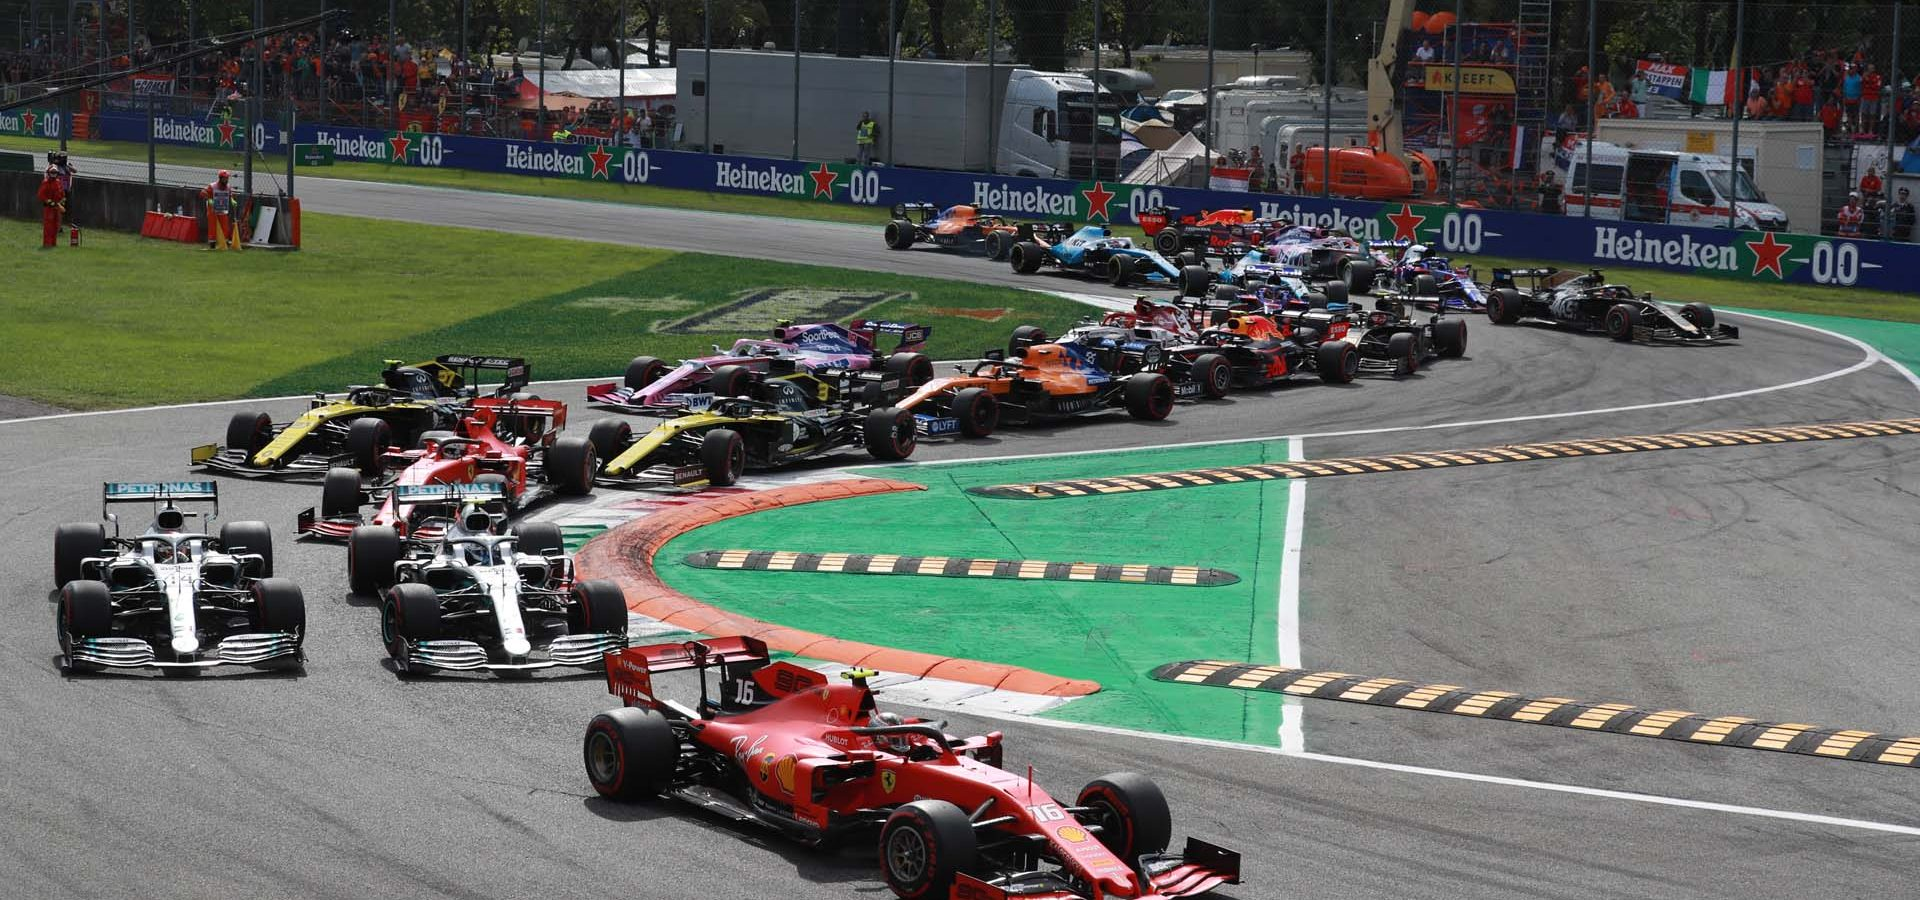 Italian Grand Prix, Monza, start